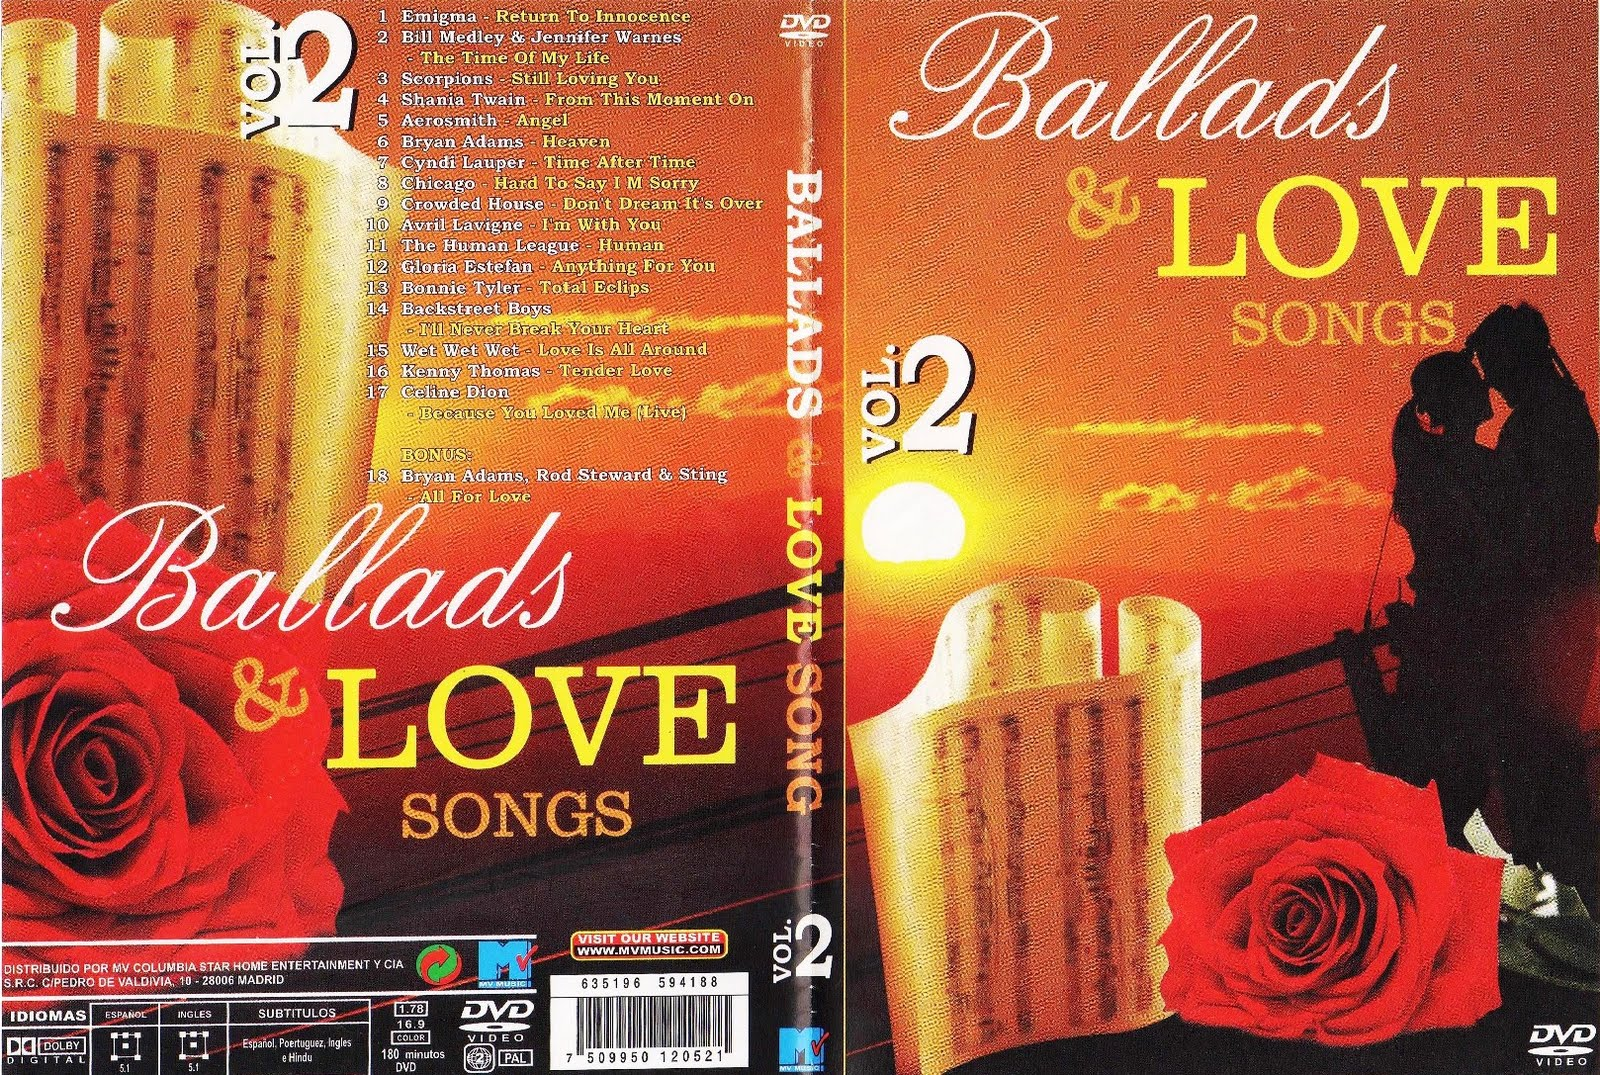 Download Ballads & Love Songs Vol.2 DVD-R ballads love songs vol 2 capa01